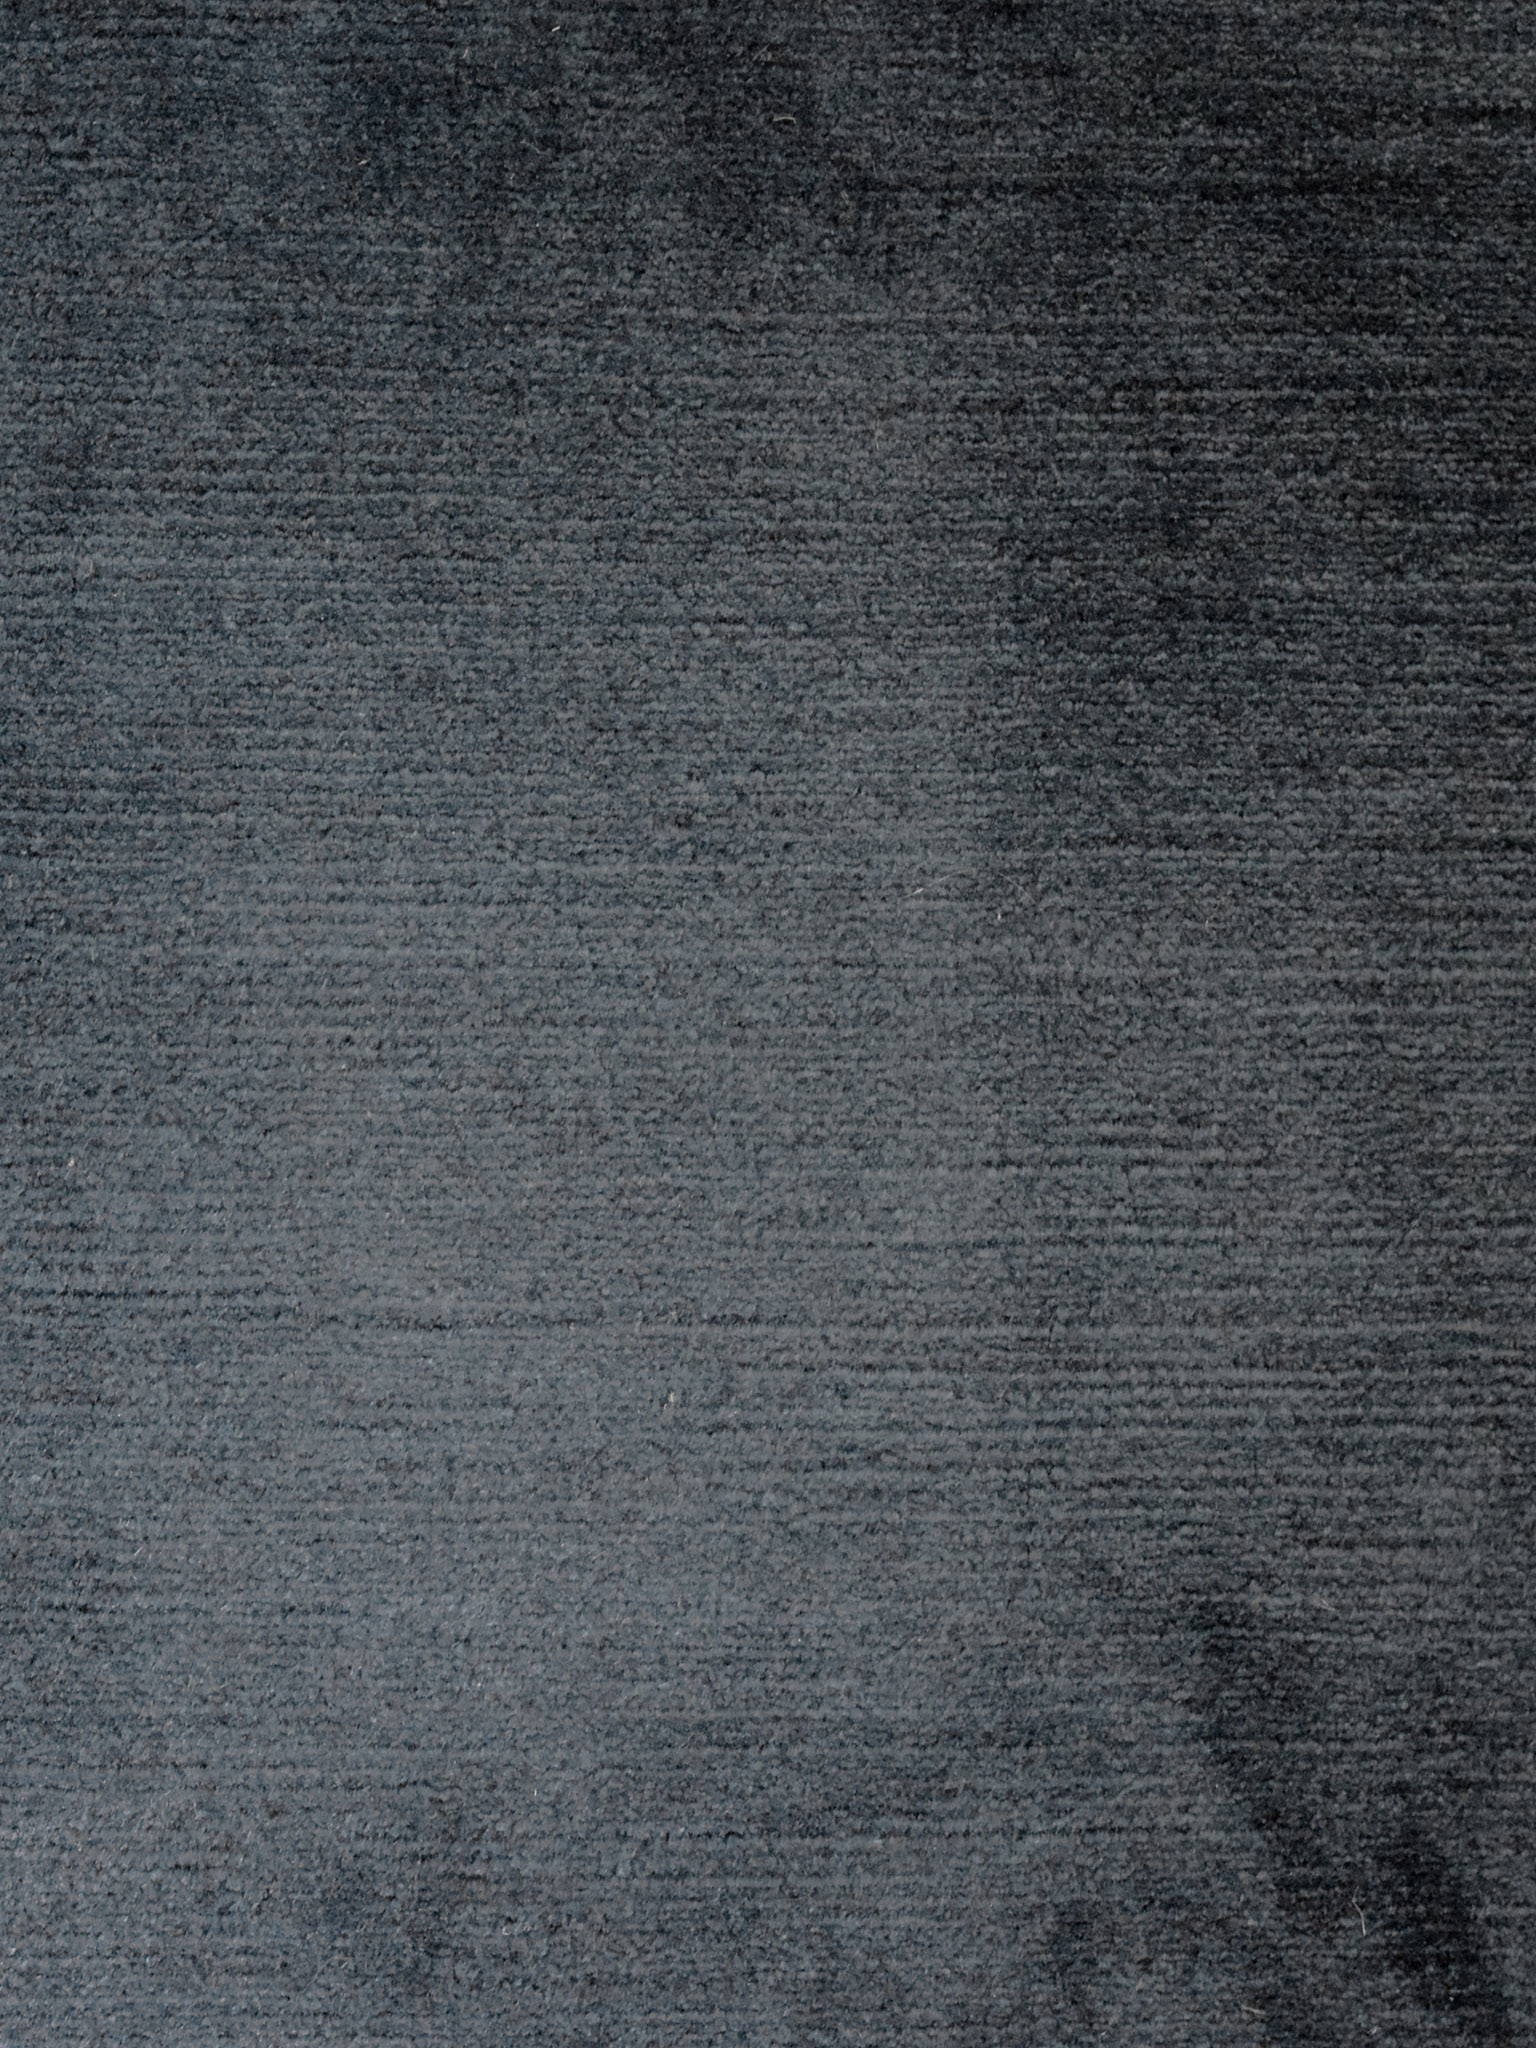 Muga Silk Solid HSPSA16113/310